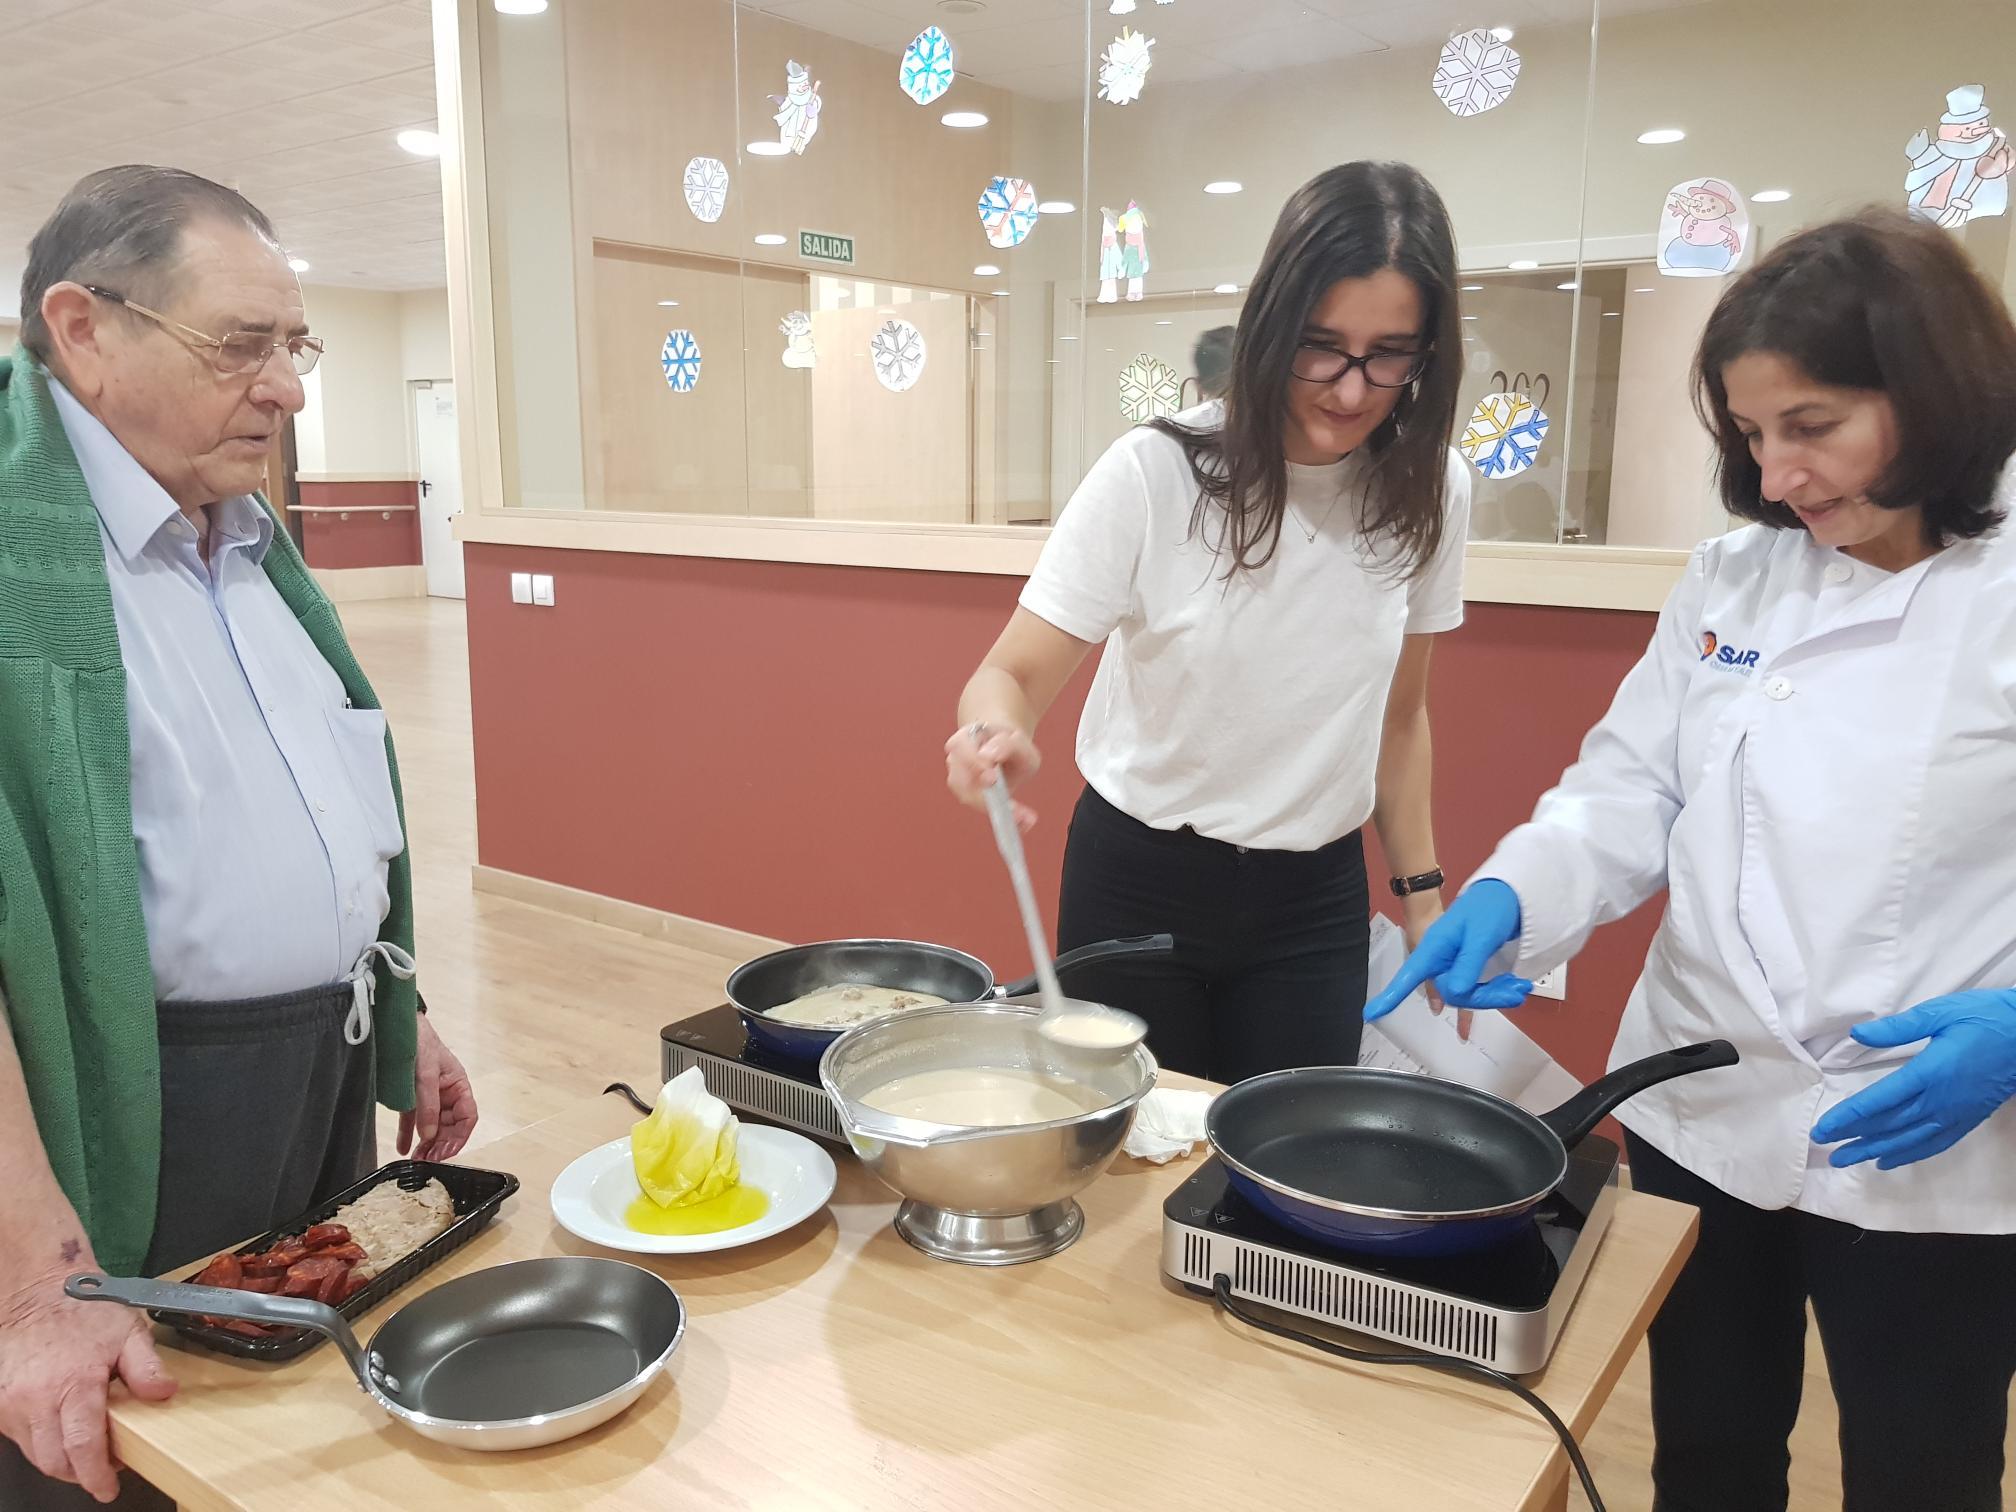 Marta Nati Ricardo cocinando Matogrande